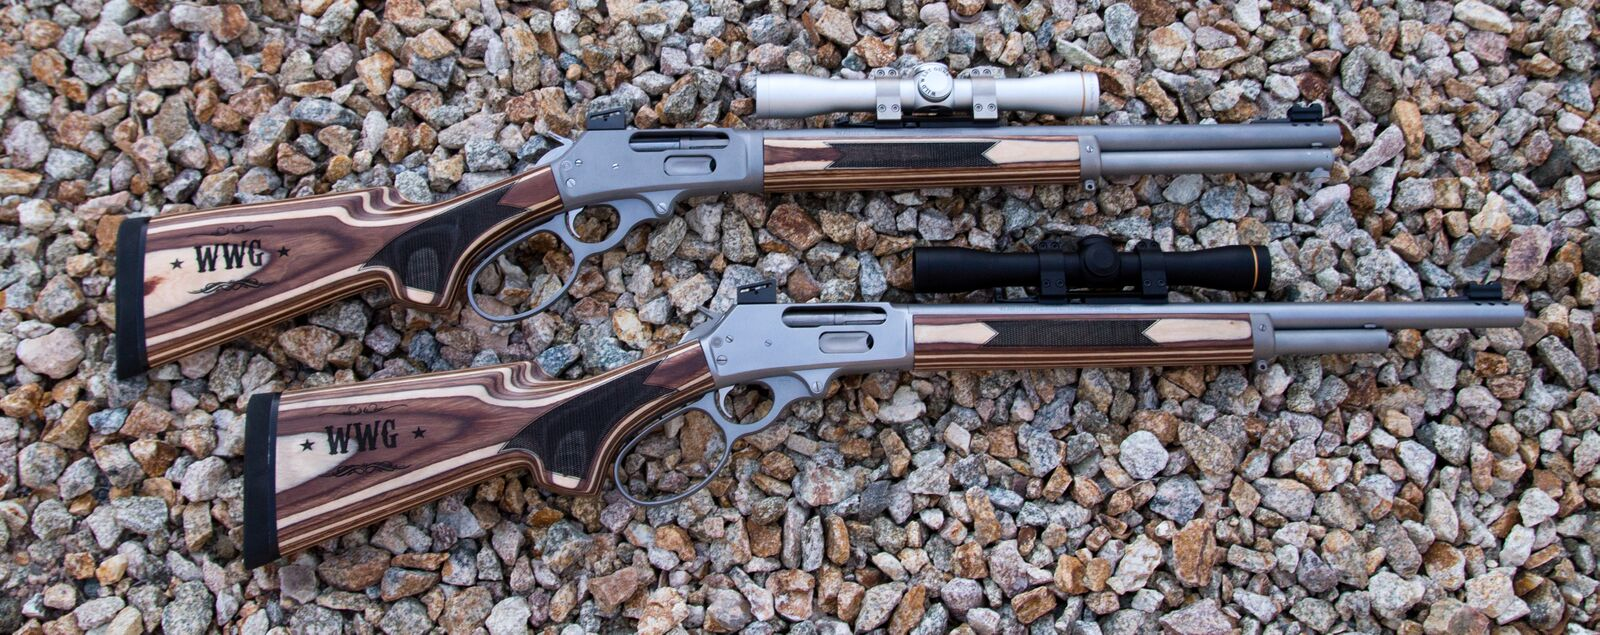 Wild west guns alaska guide 457mag/45-70 for sale.